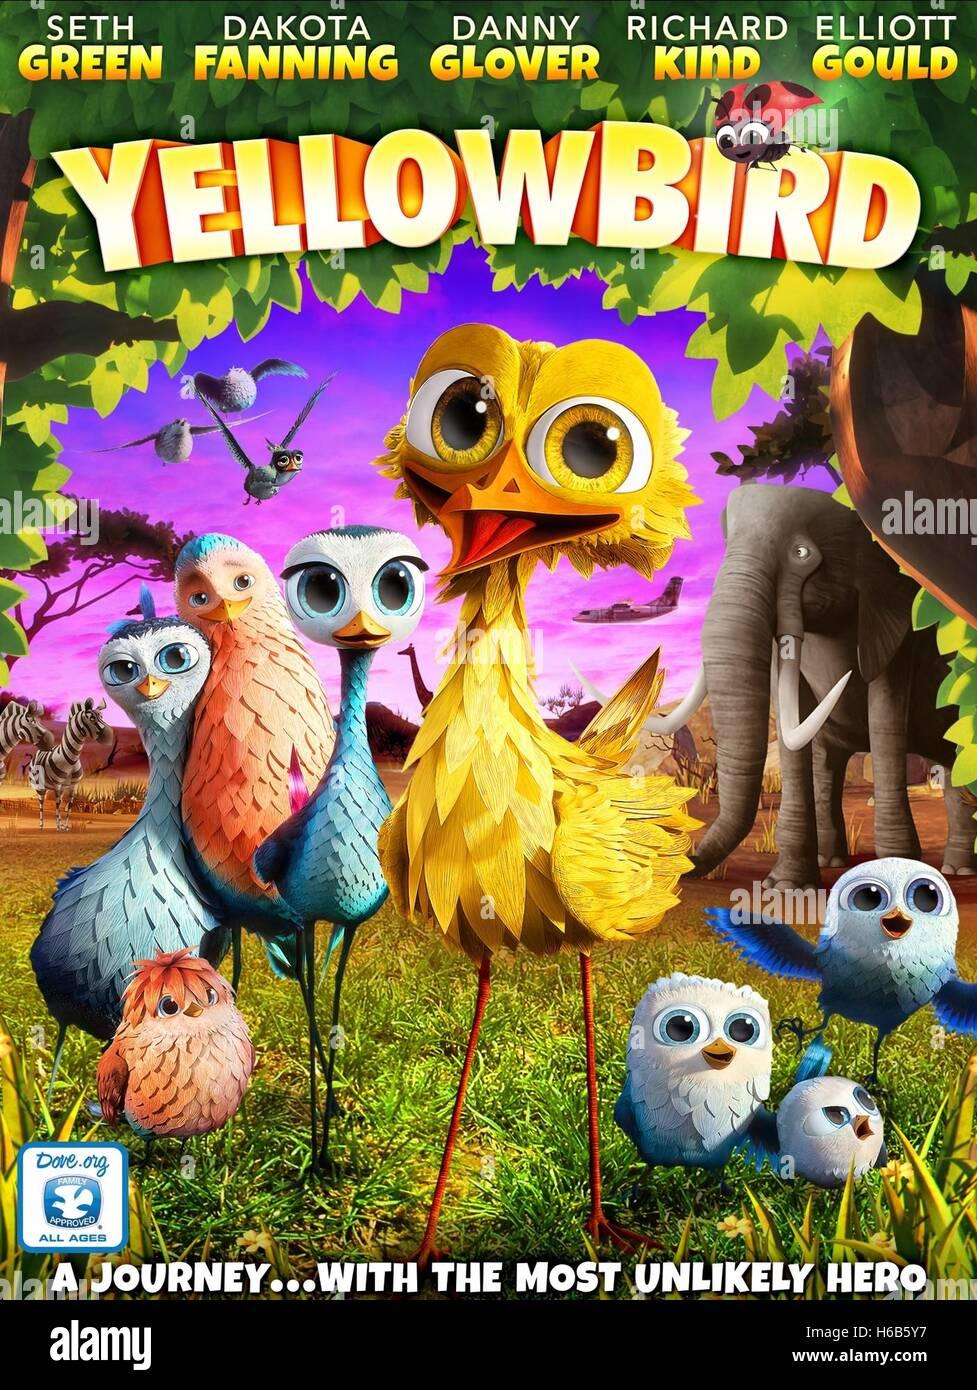 DELF YELLOWBIRD & LADYBUG POSTER YELLOWBIRD (2014) - Stock Image